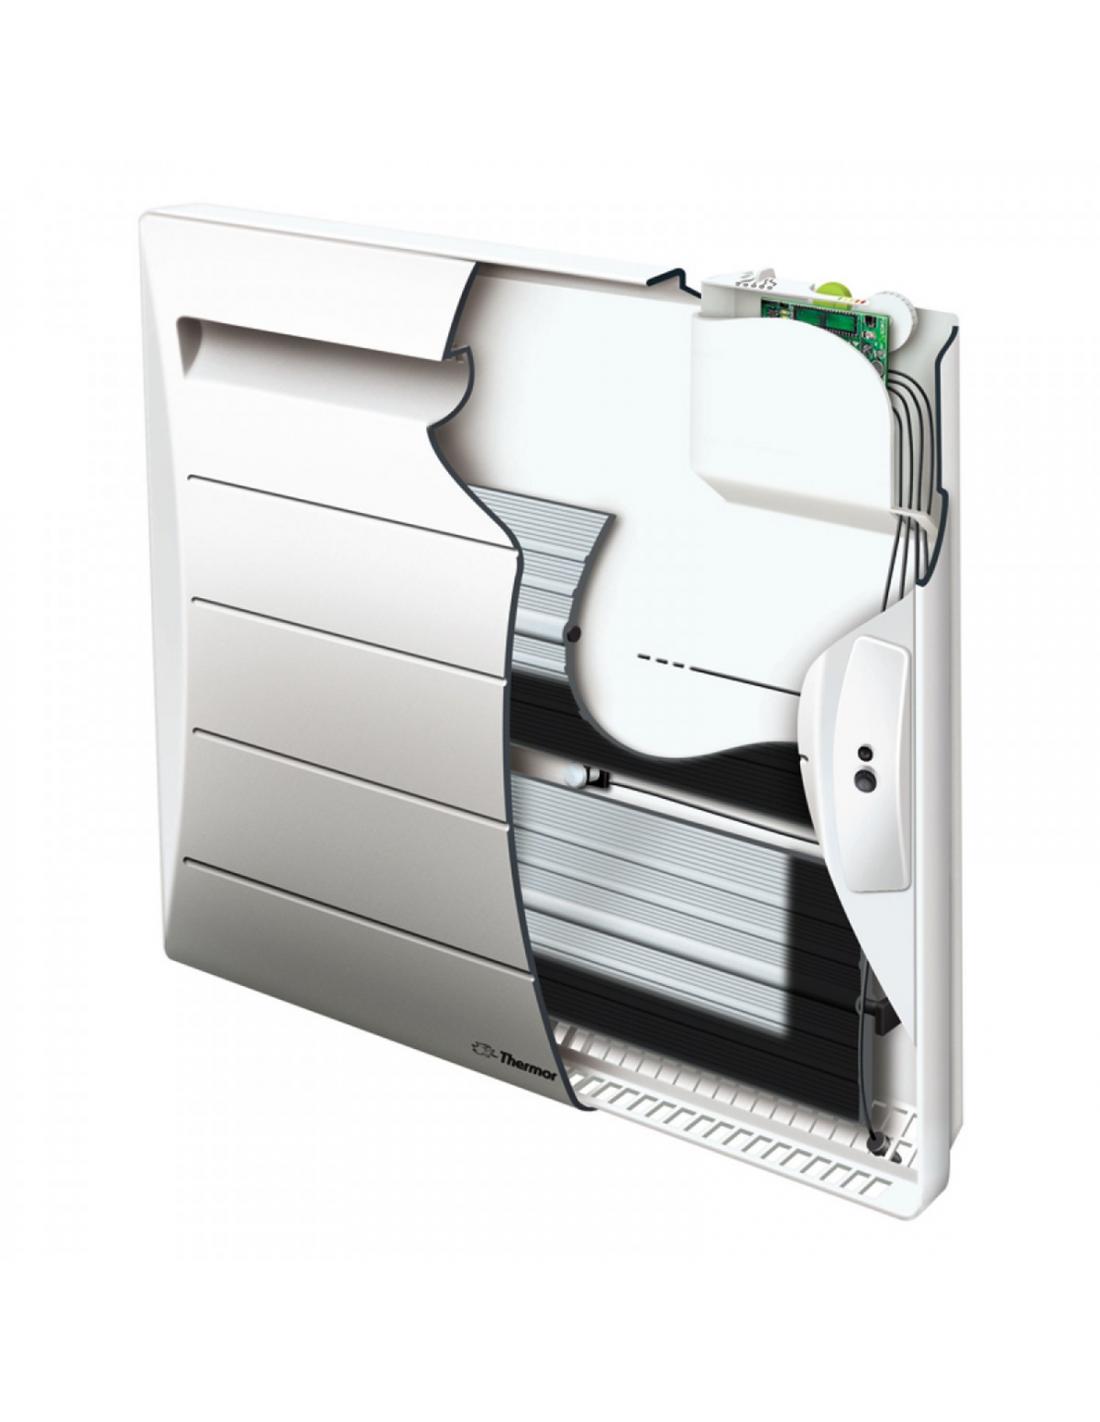 radiateur inertie vertical 2000w radiateur vertical 2000w. Black Bedroom Furniture Sets. Home Design Ideas